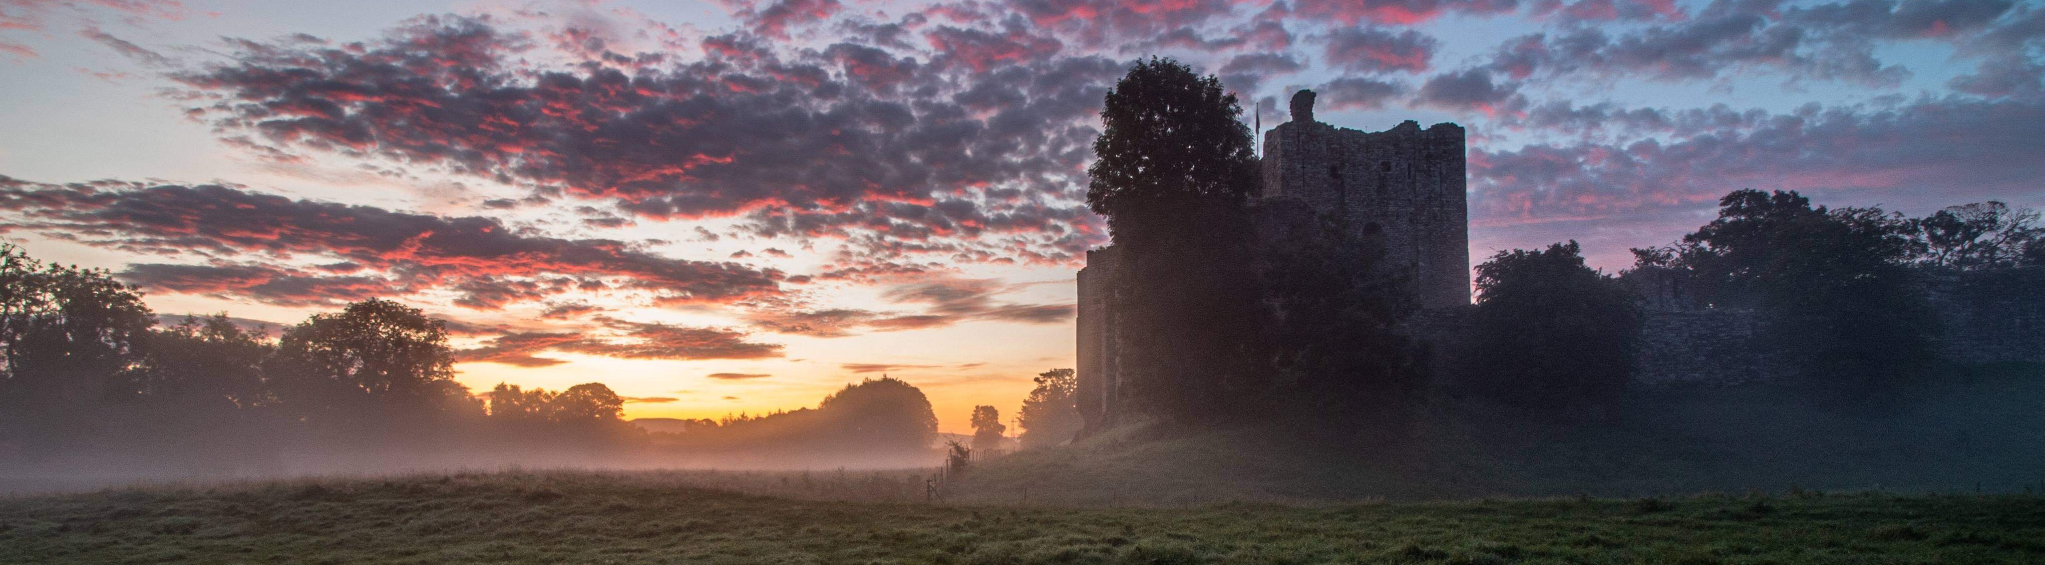 Brougham Castle through the mist by Lee Benson